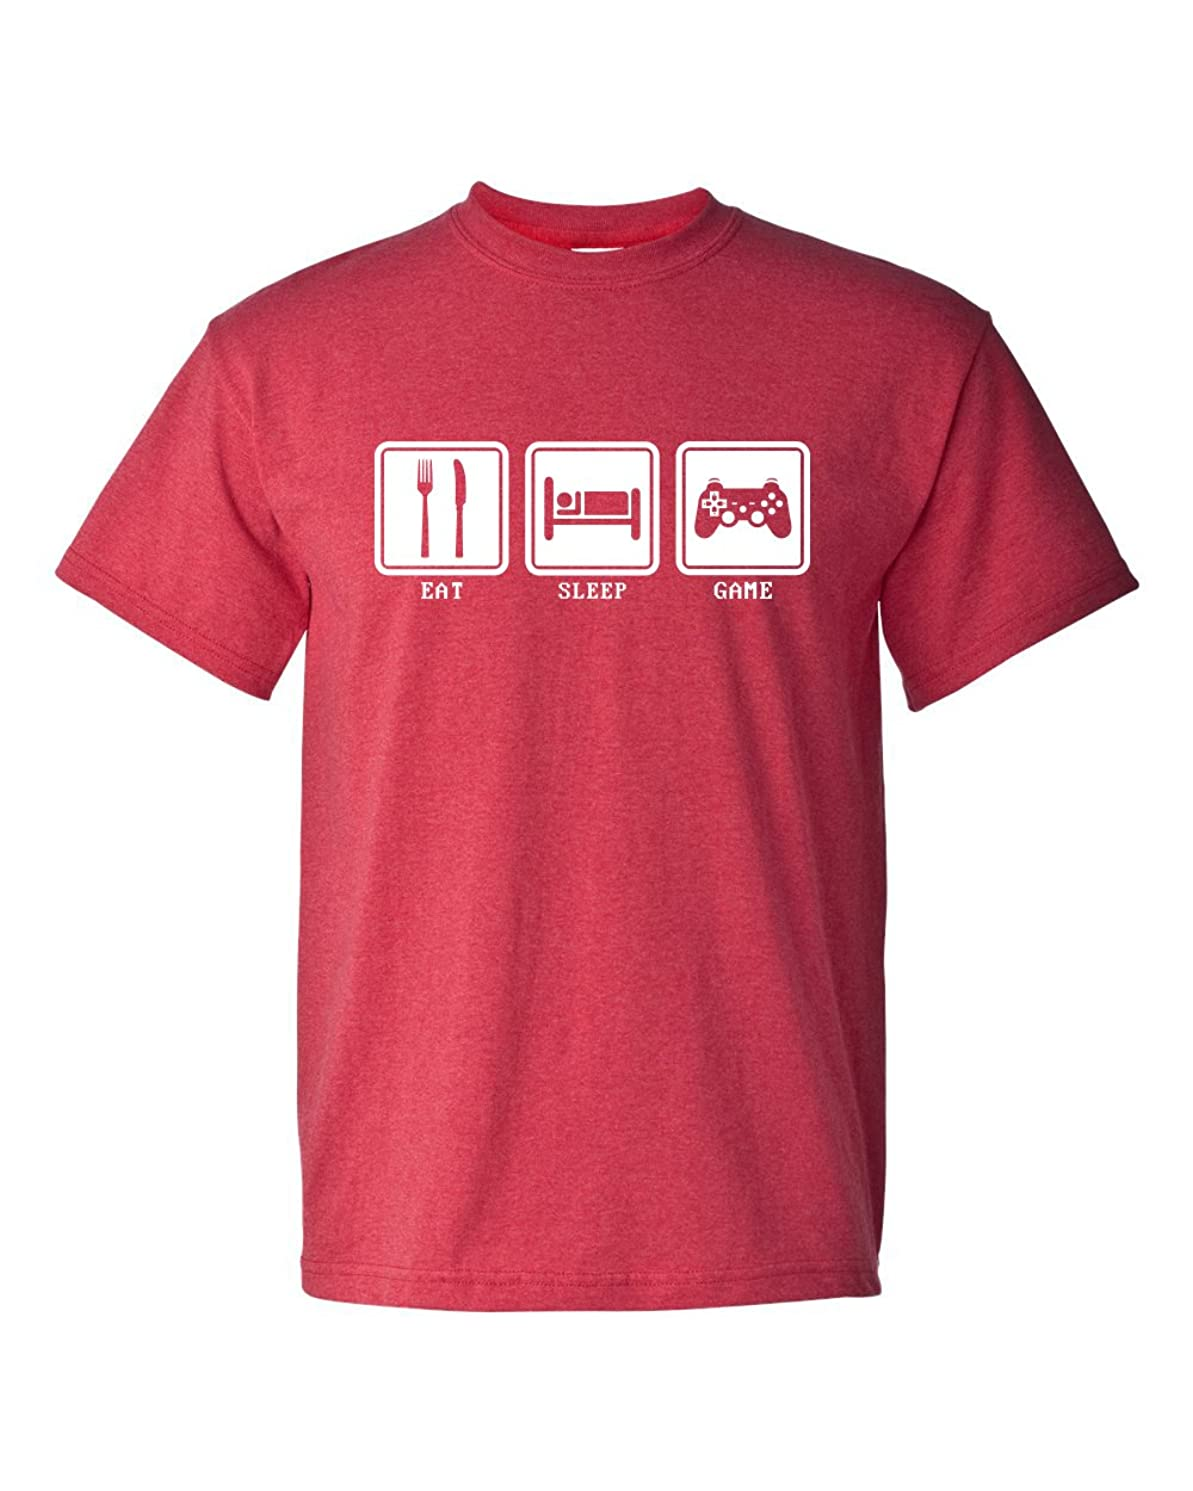 Eat Sleep Game Video Games Controller Gamer Funny Adult Men's T-Shirt